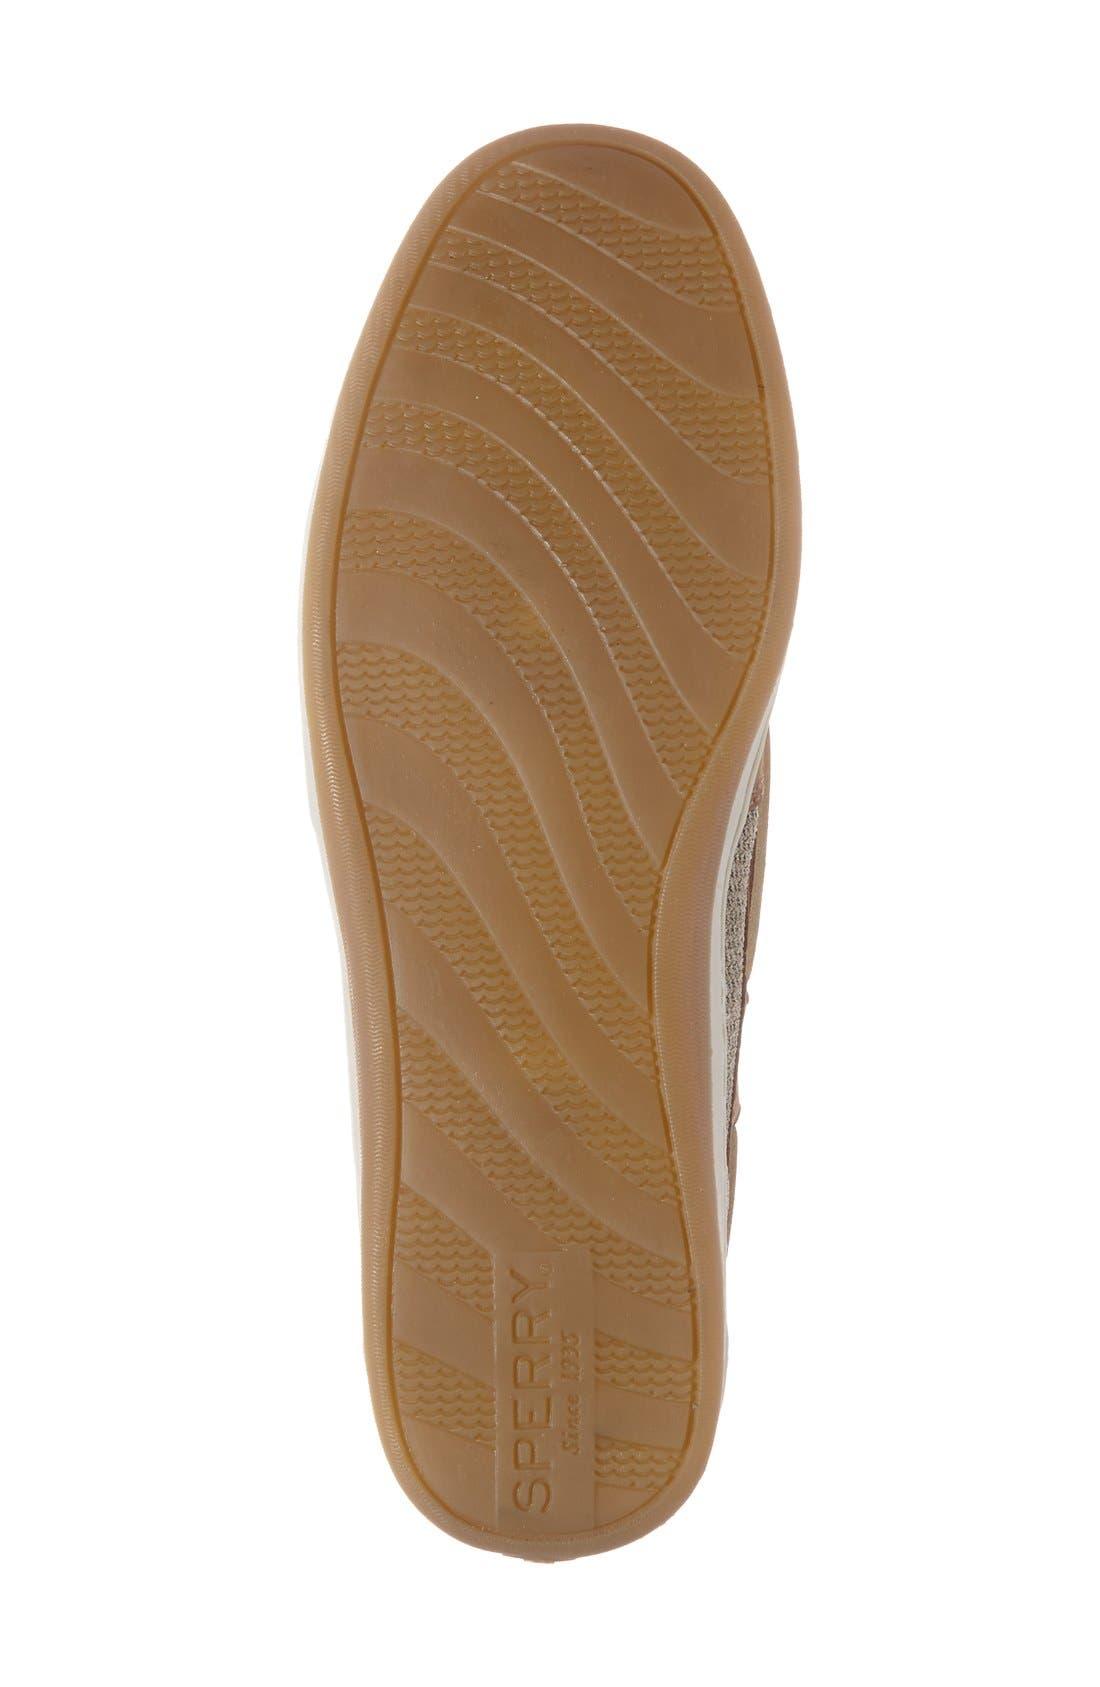 'Firefish' Flat,                             Alternate thumbnail 4, color,                             Linen/ Oat Leather